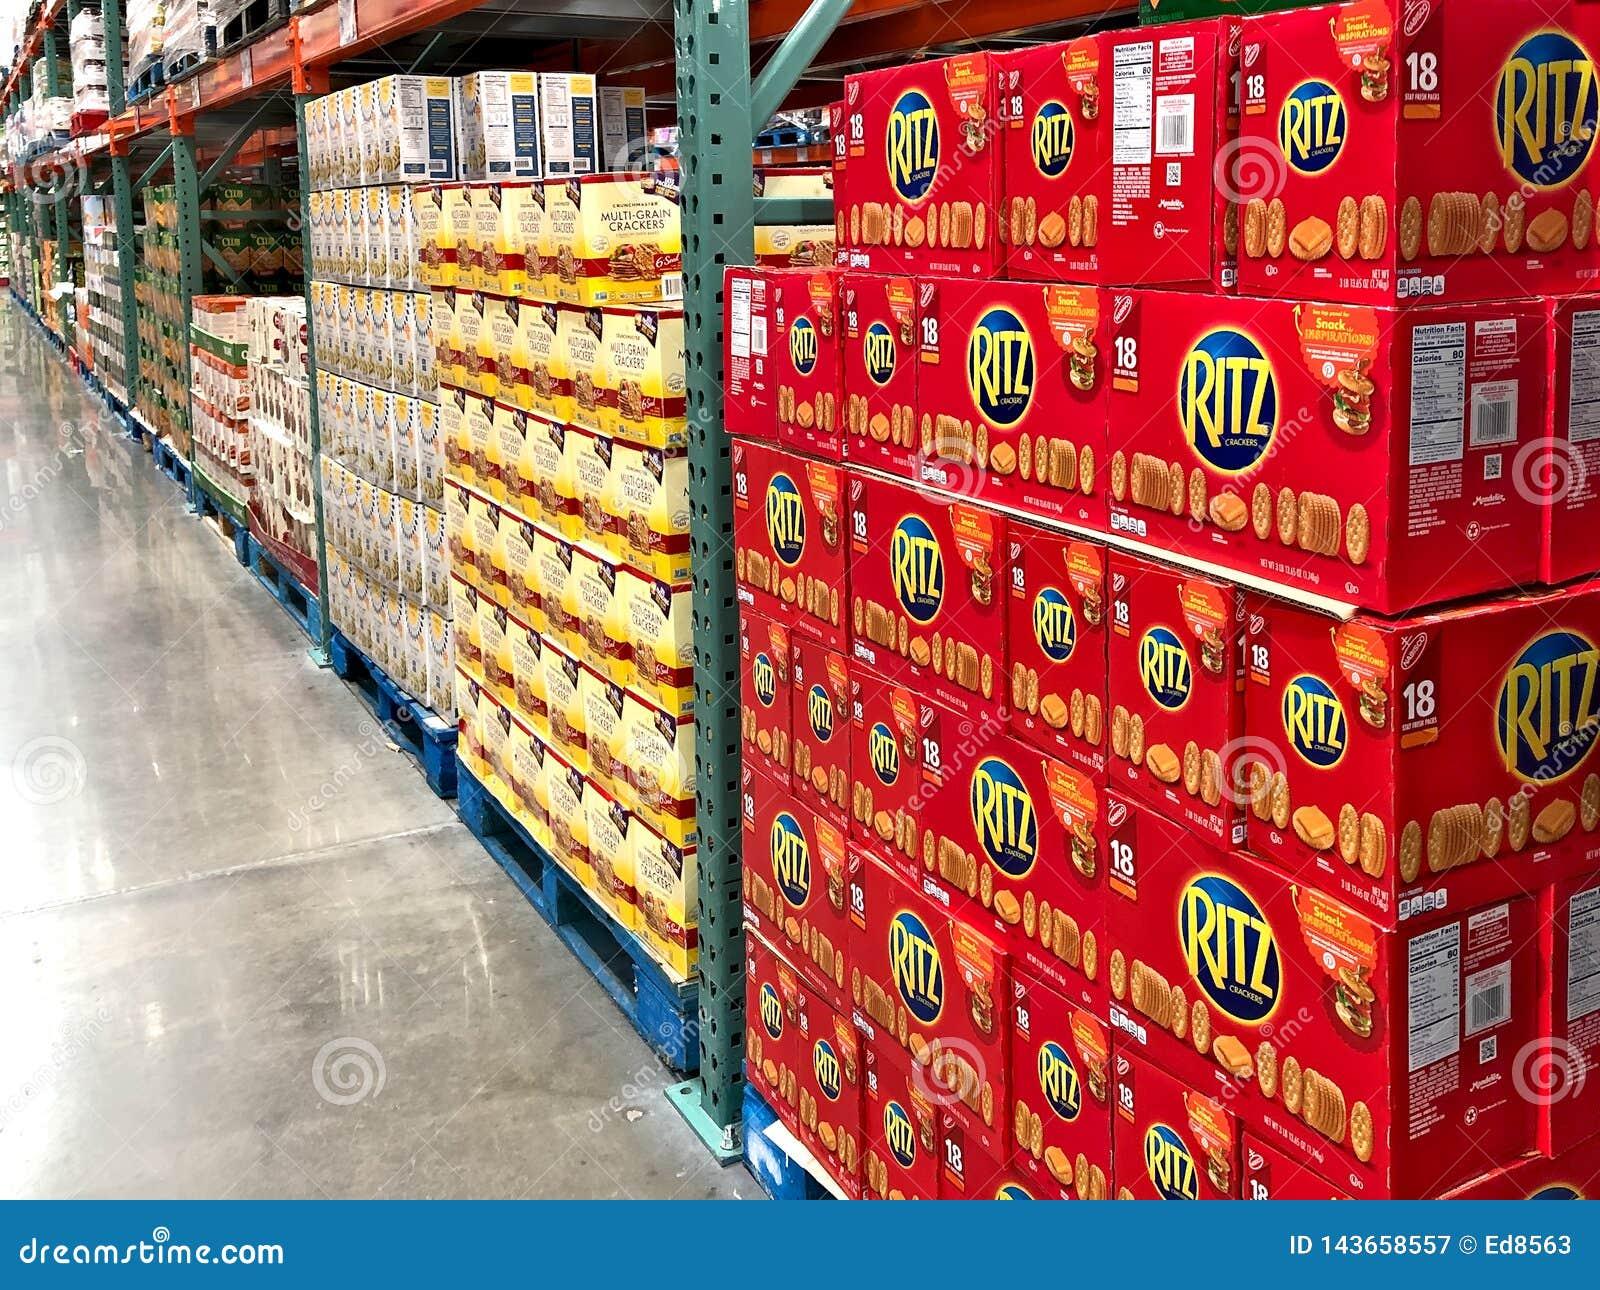 BRAINERD, MN - 31 MAR 2019: Pallet of Ritz cracker boxes on display in store